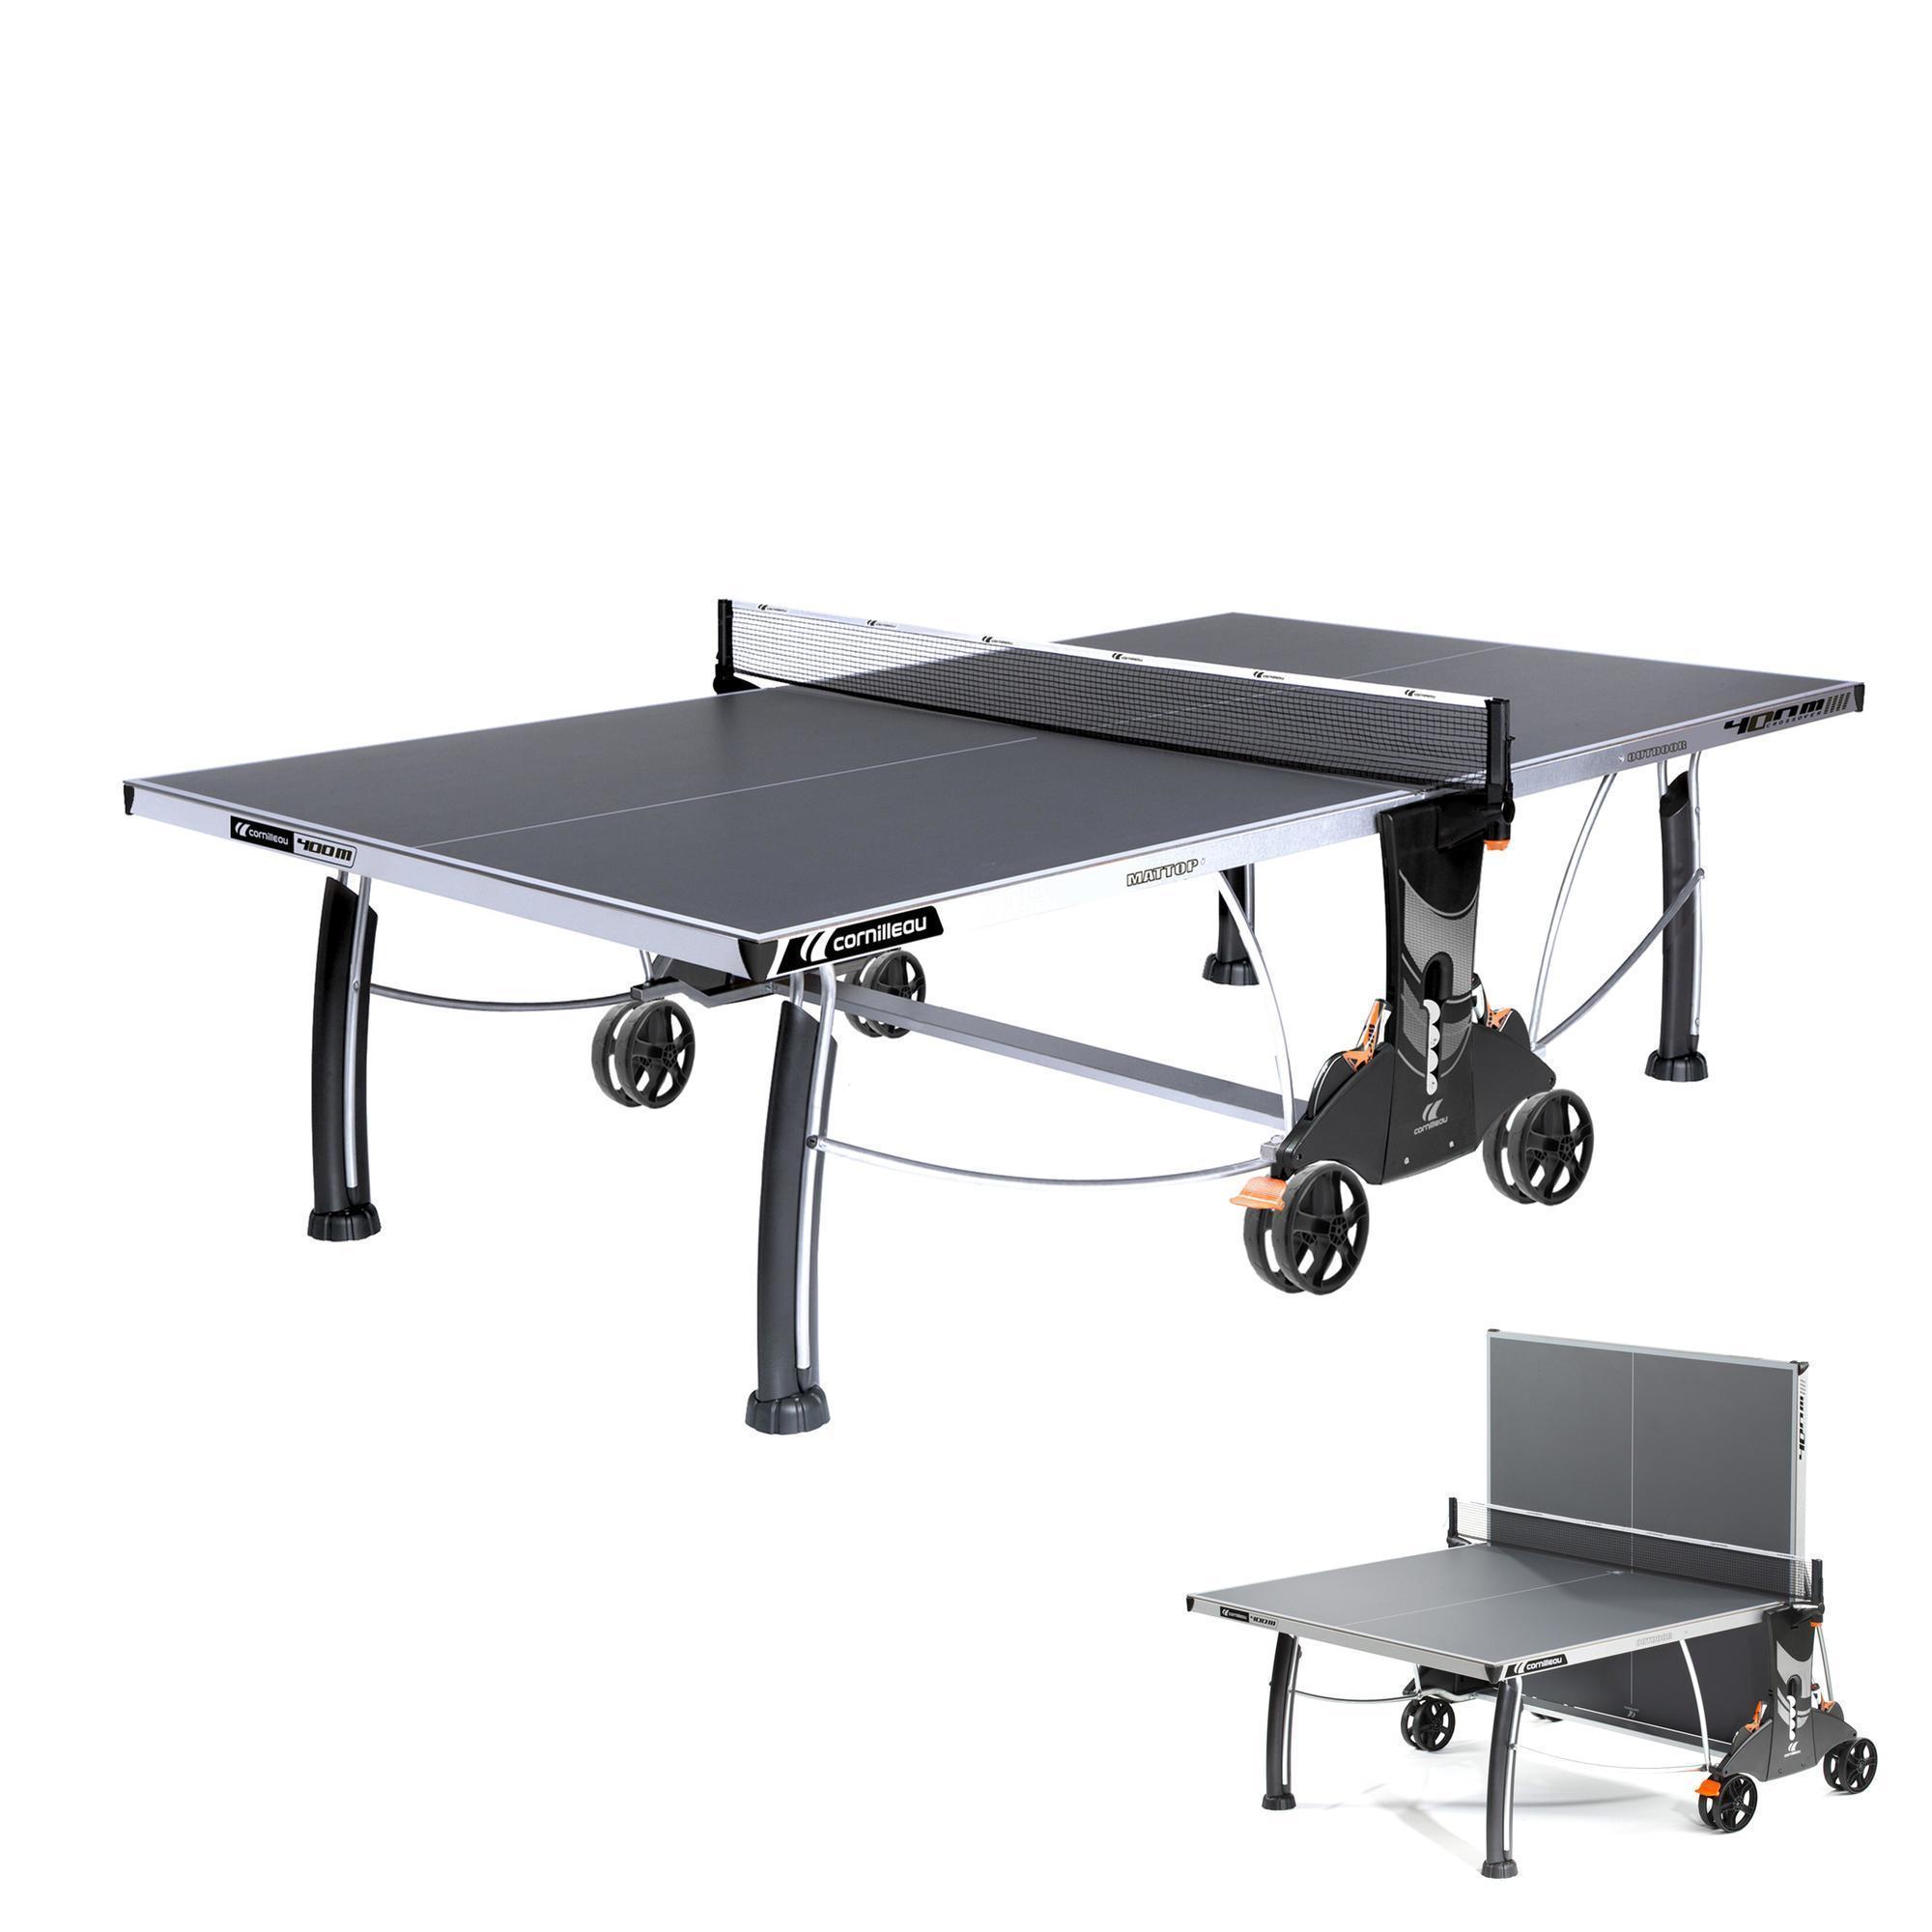 TABLE DE TENNIS DE TABLE FREE CROSSOVER 400S OUTDOOR GRISE